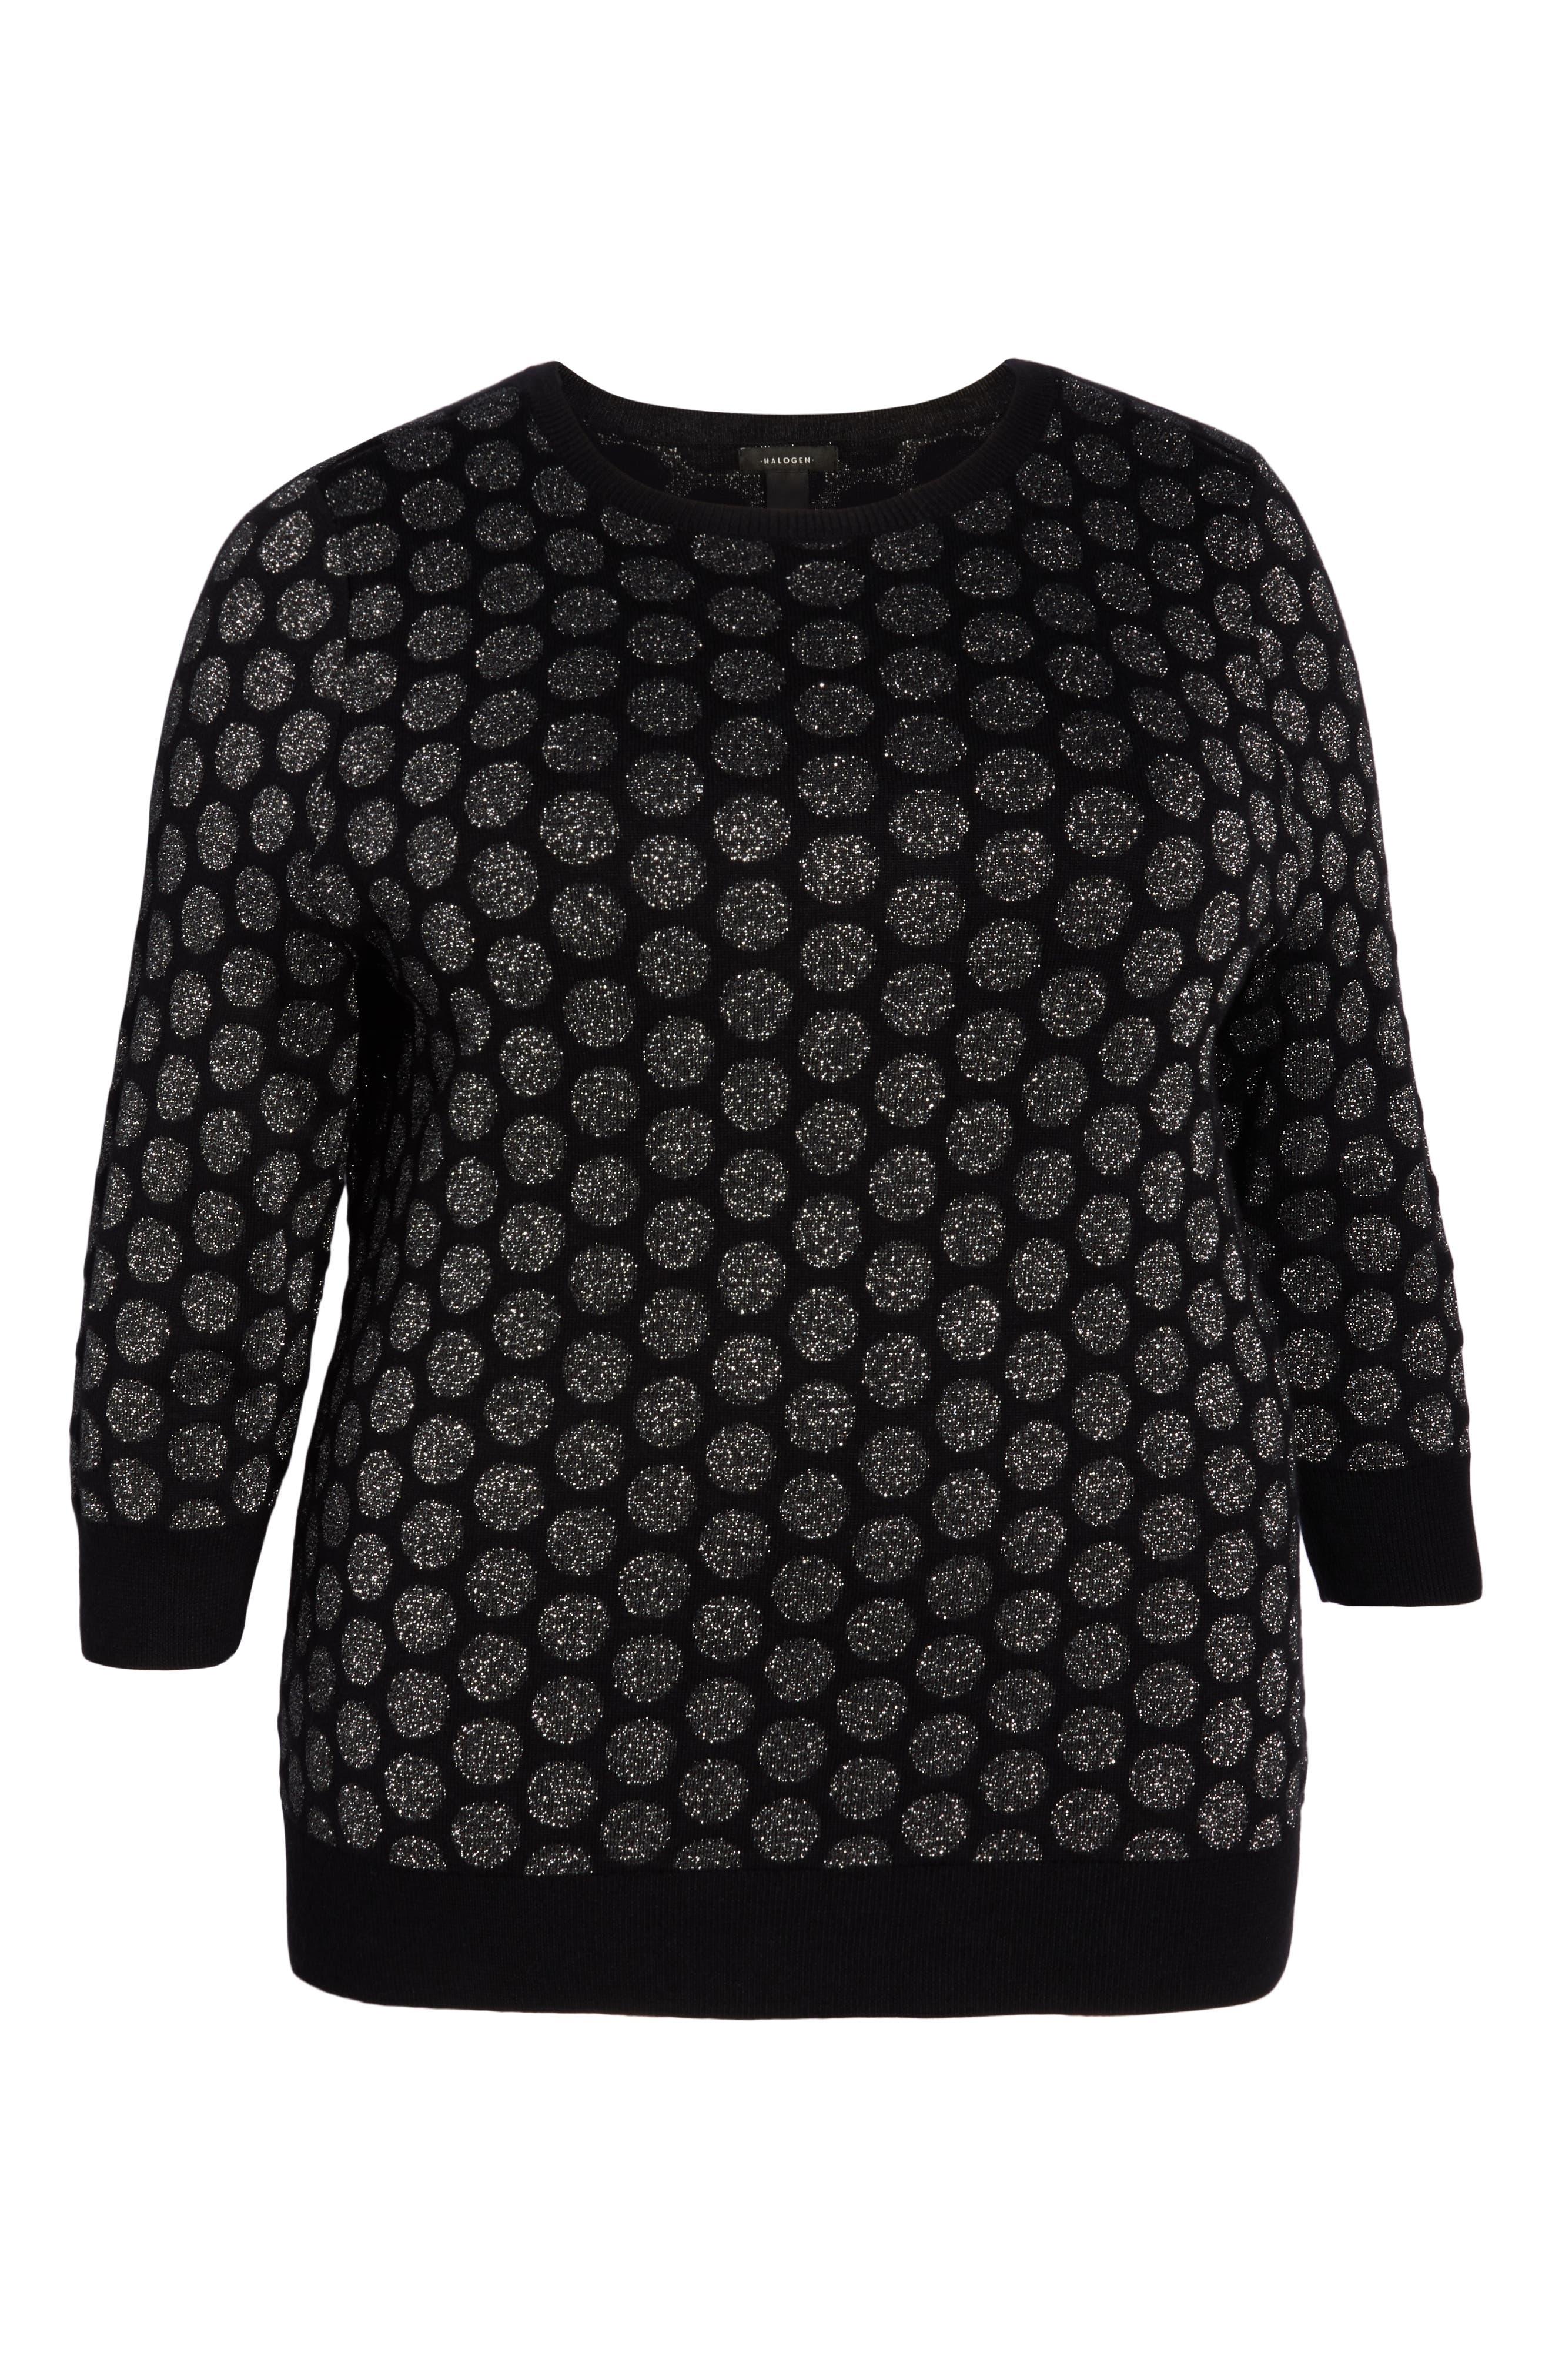 x Atlantic-Pacific Shimmer Dot Sweater,                             Alternate thumbnail 6, color,                             BLACK